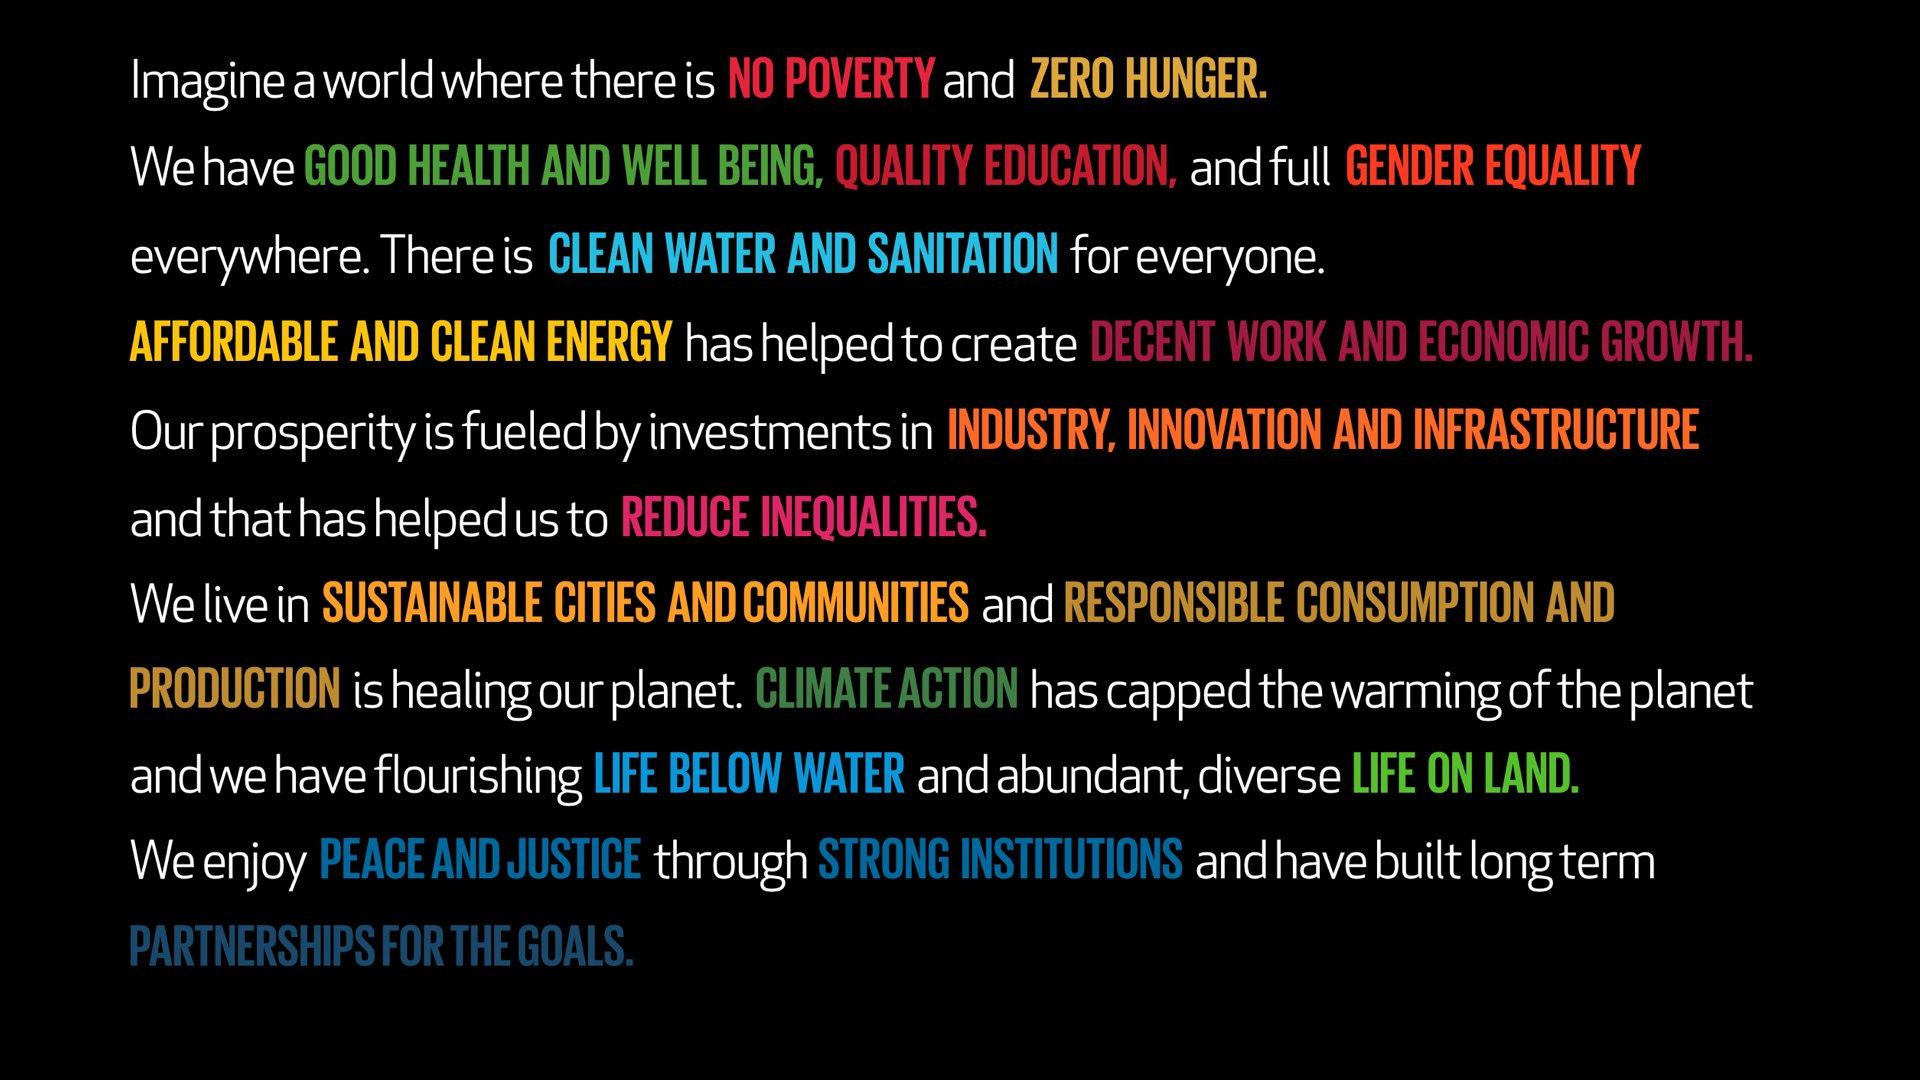 GlobalGoals_Manifesto